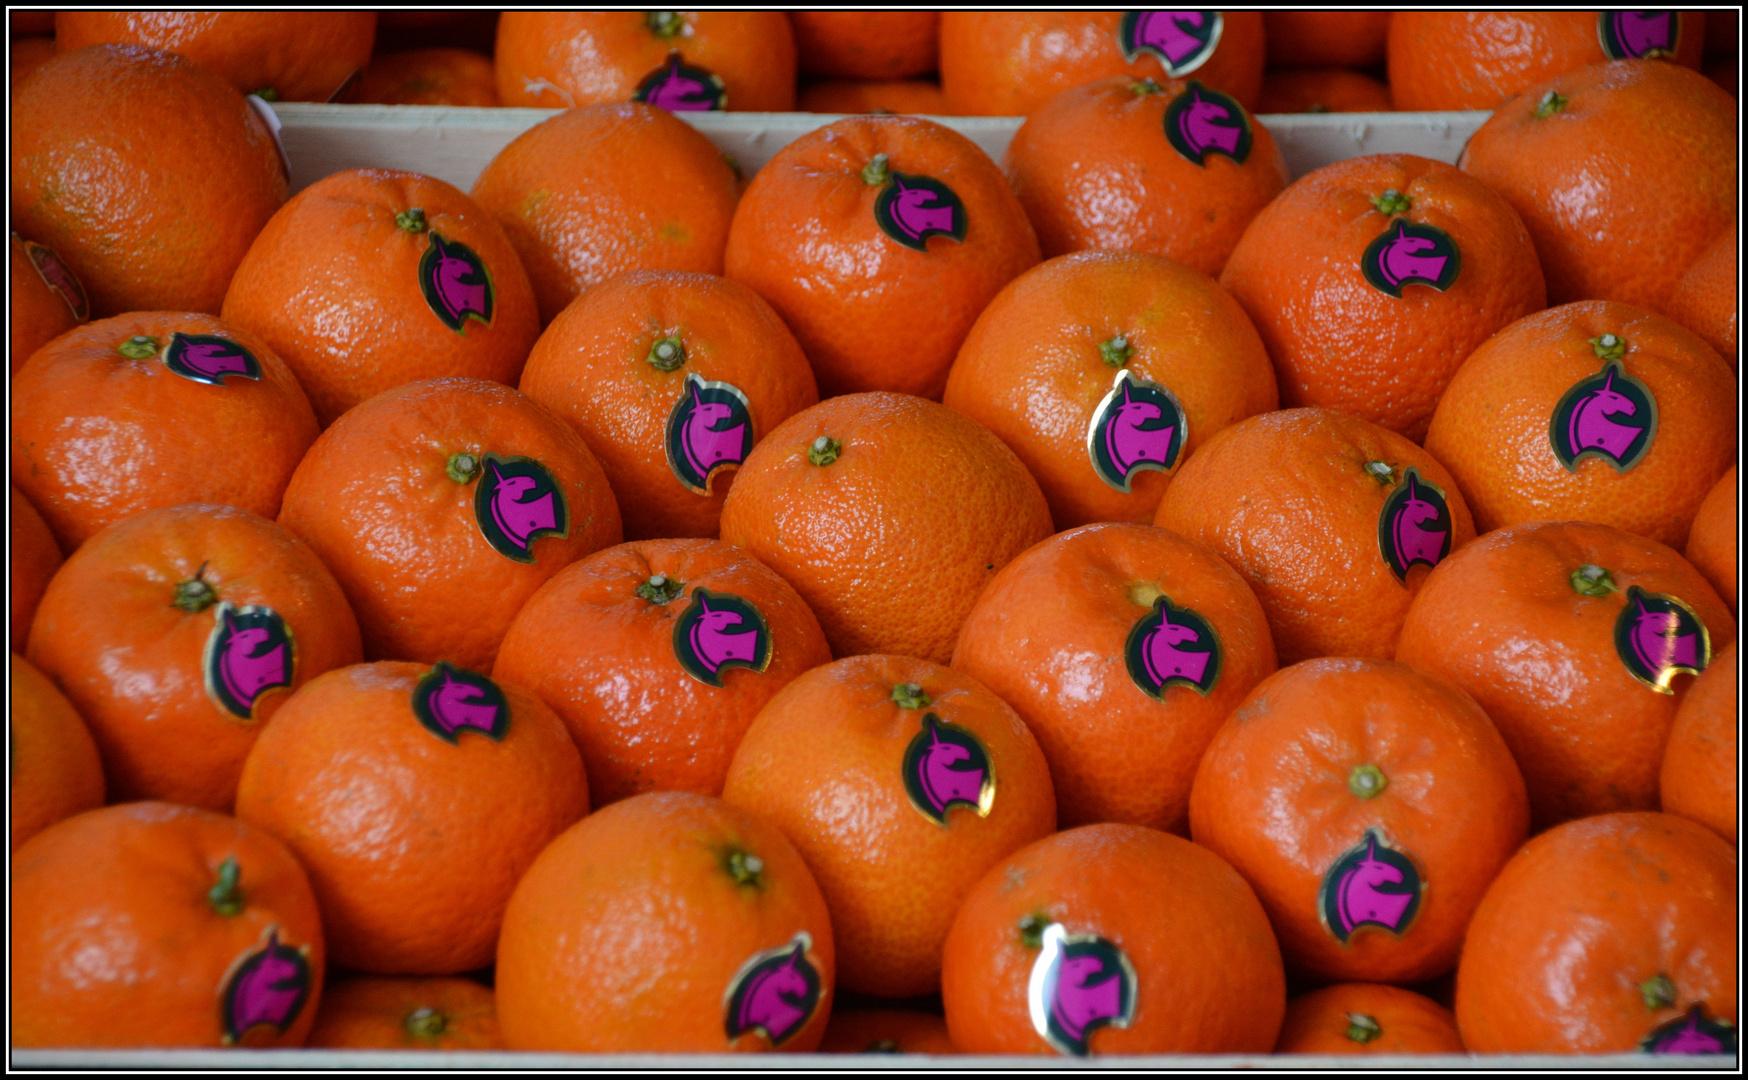 geordnetes Vitamin C